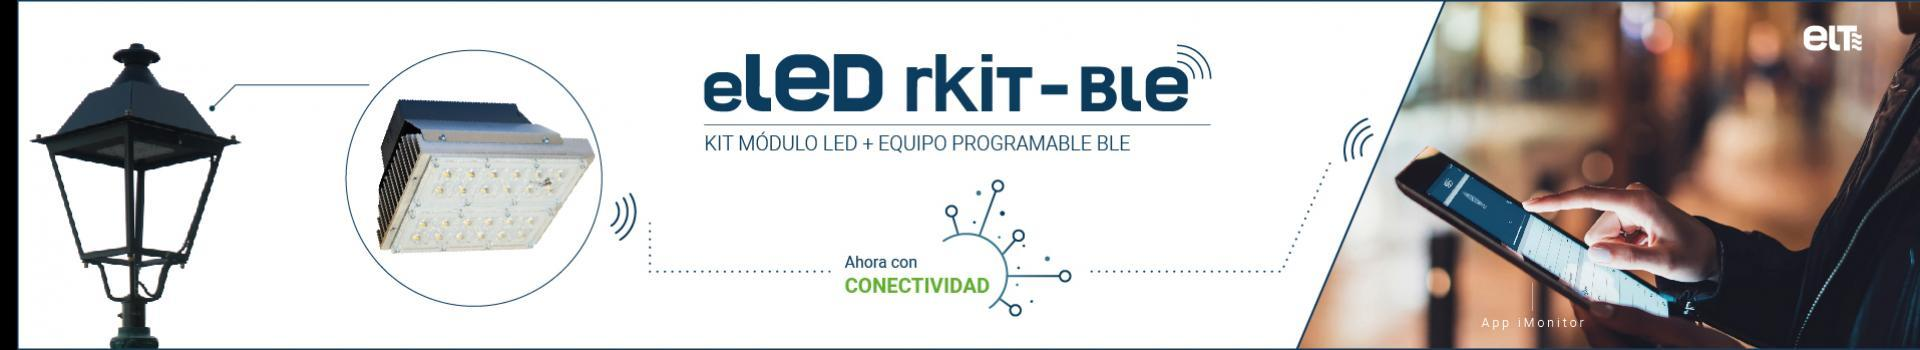 eLED RKIT-BLE